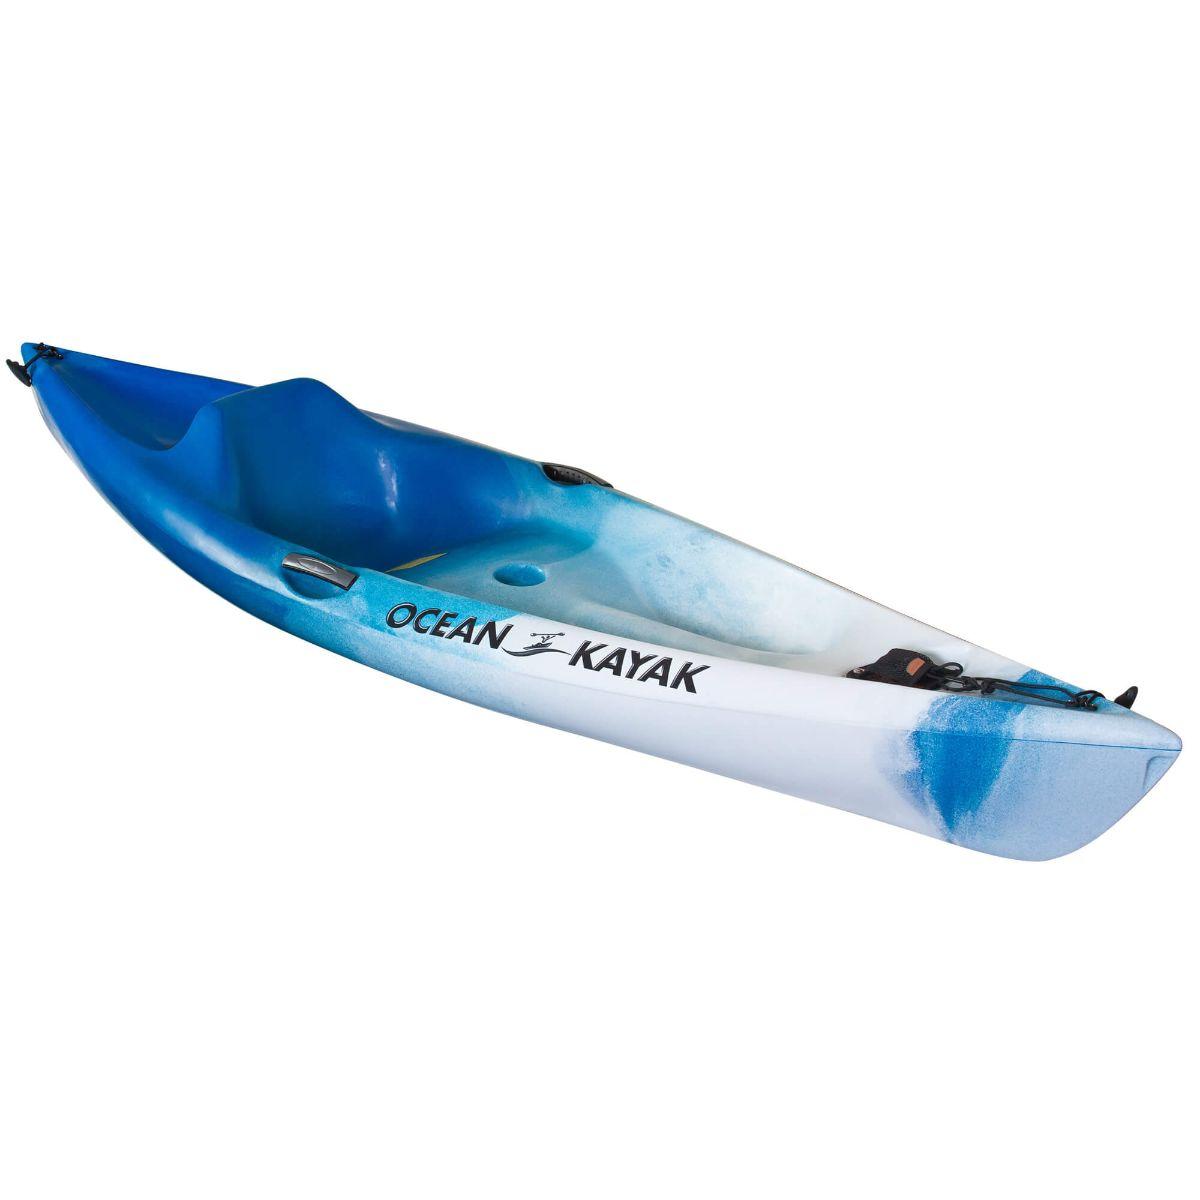 Vente kayak usagé